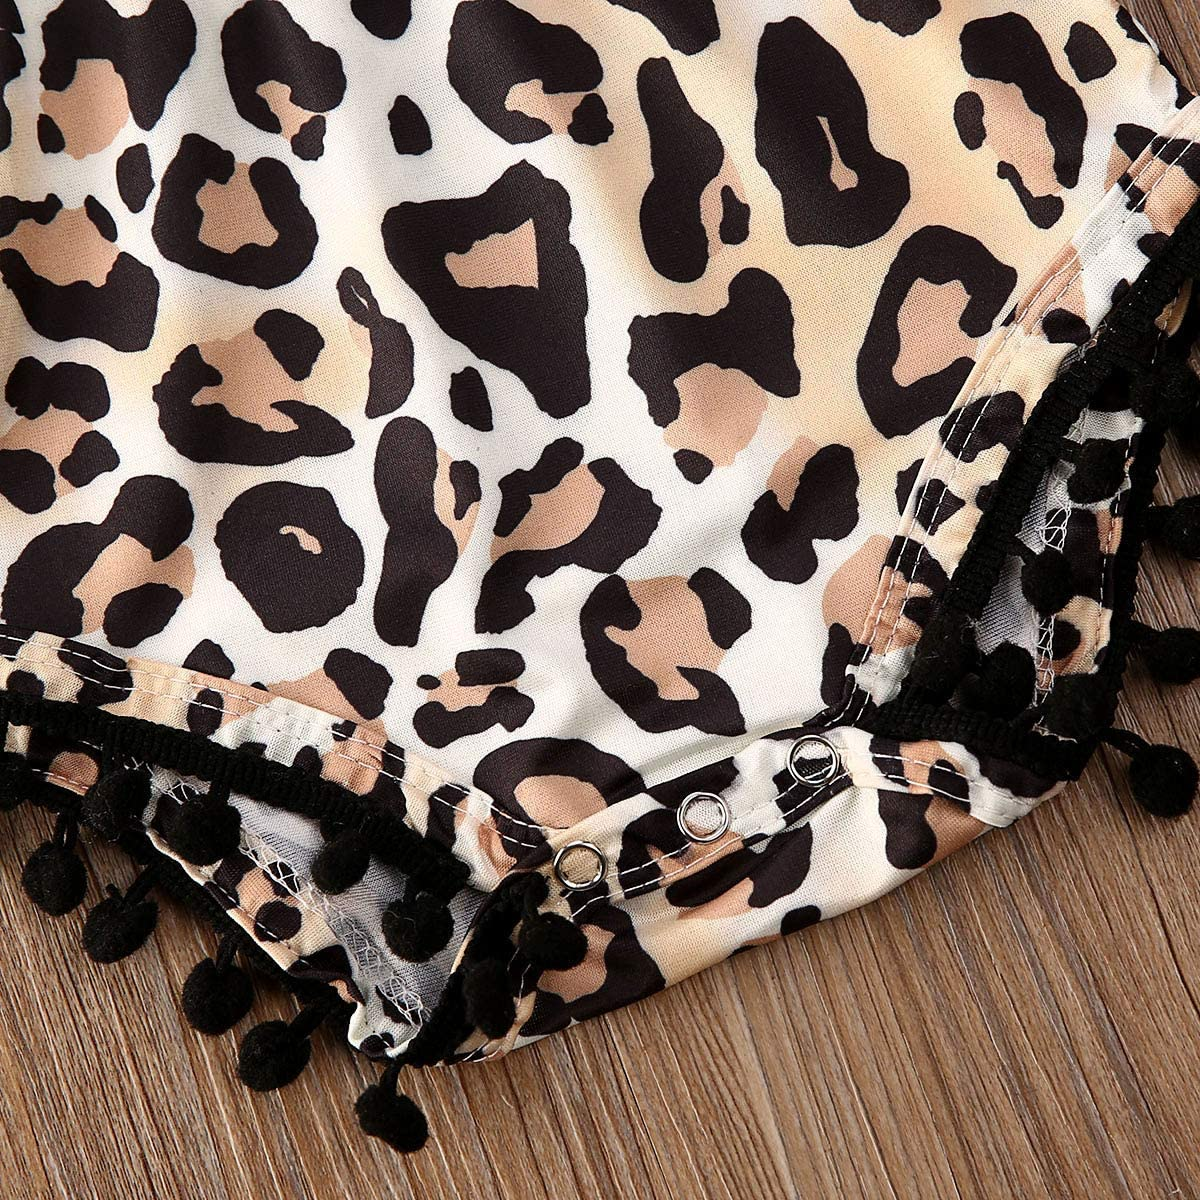 Mialoley Baby Girl Cotton Leopard Romper Sleveless One Piece Cheetah Print Bodysuit with Pom Poms Jumpsuit Sunsuit Outfit